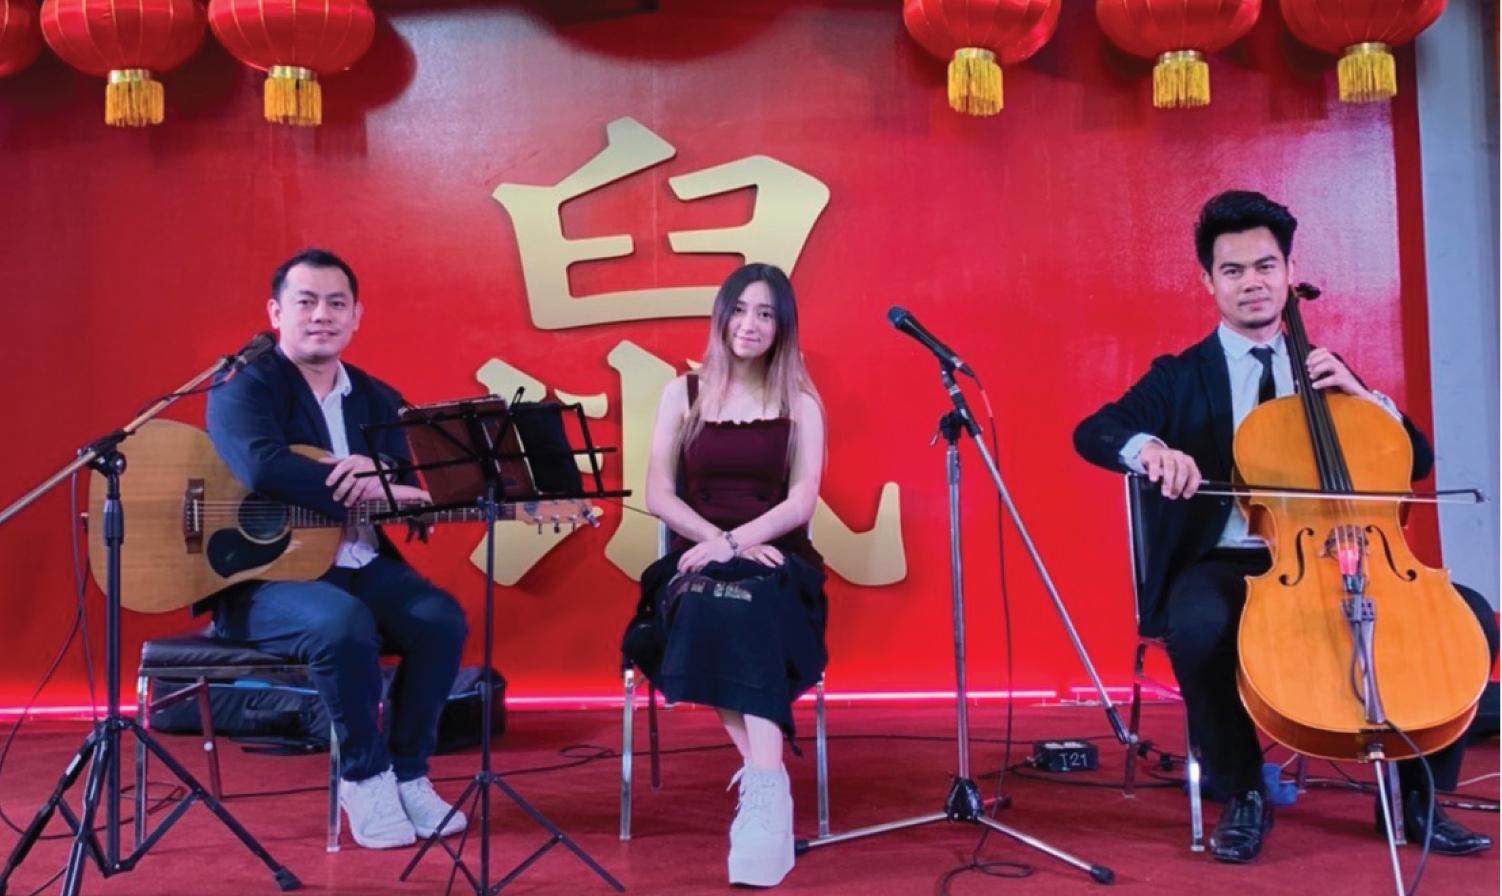 Nitaa มอบความสุขในงาน Chinese New Year ที่ศูนย์การค้า Terminal21 สาขาอโศก